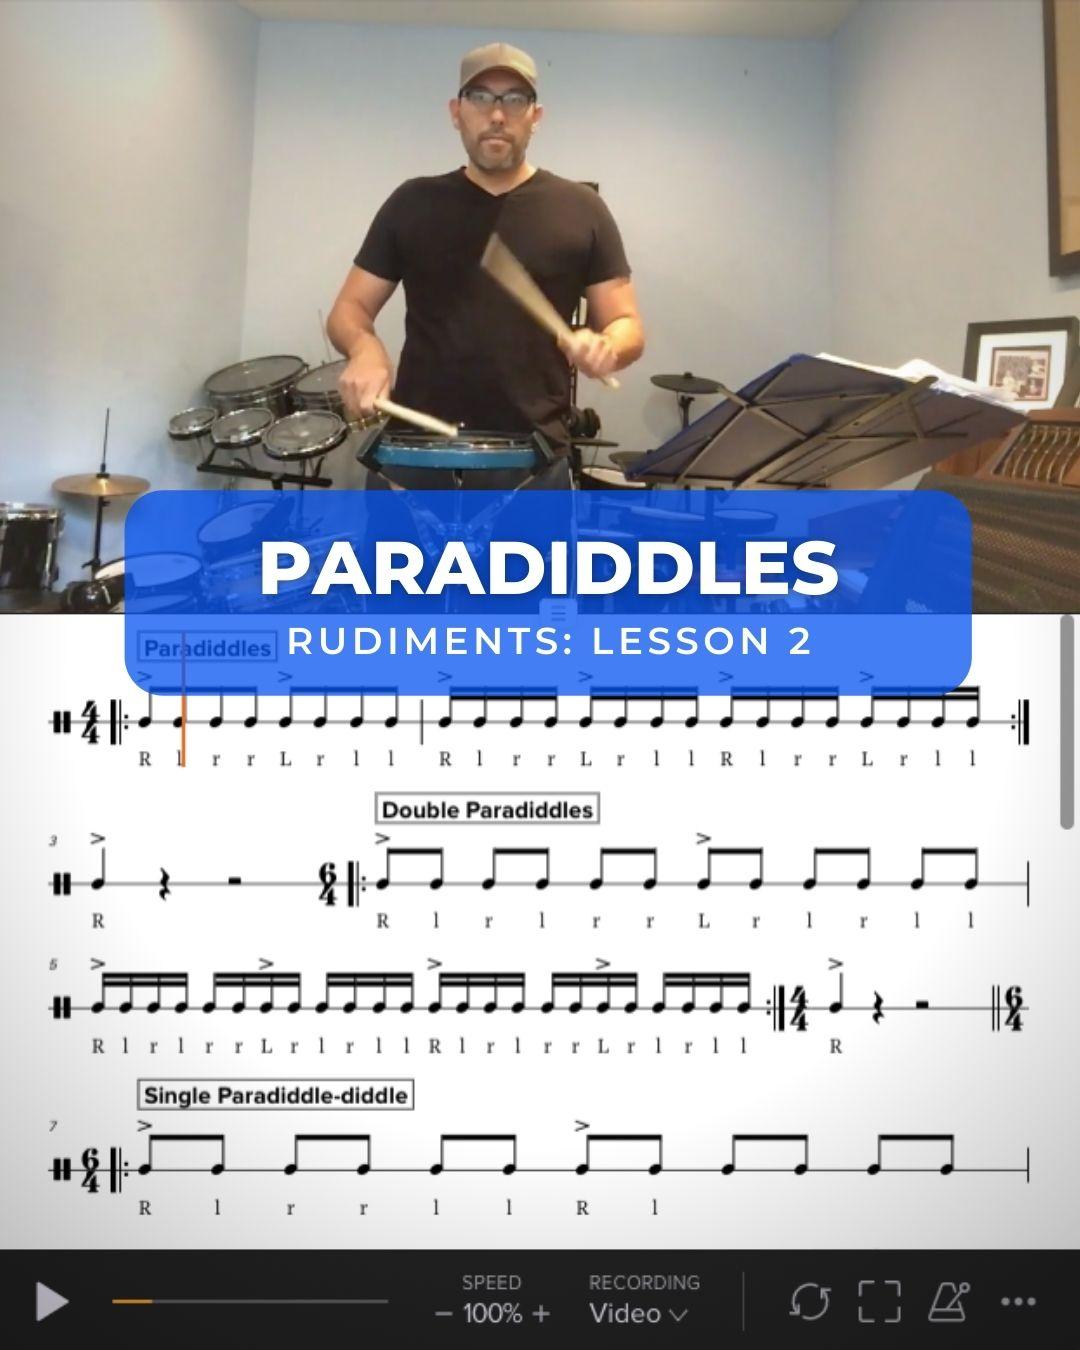 Paradiddles, Double Paradiddles, Paradiddle-diddles, Triple Paradiddles and Paradiddle Variation